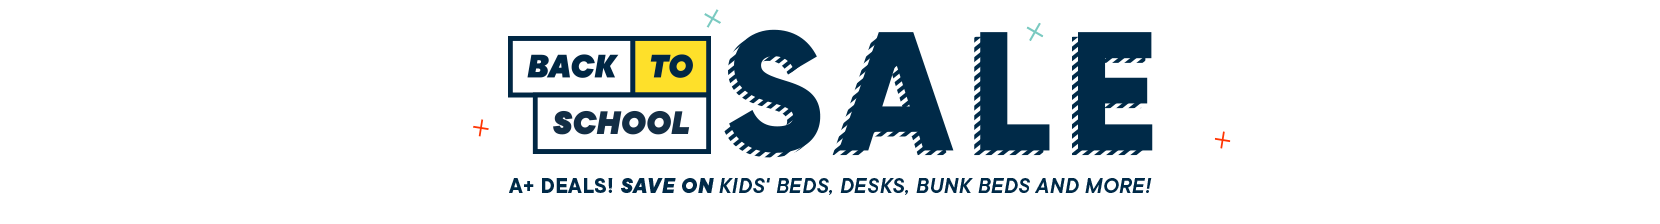 back to school sale. A+ deals! save on kids beds, desks, bunks and more